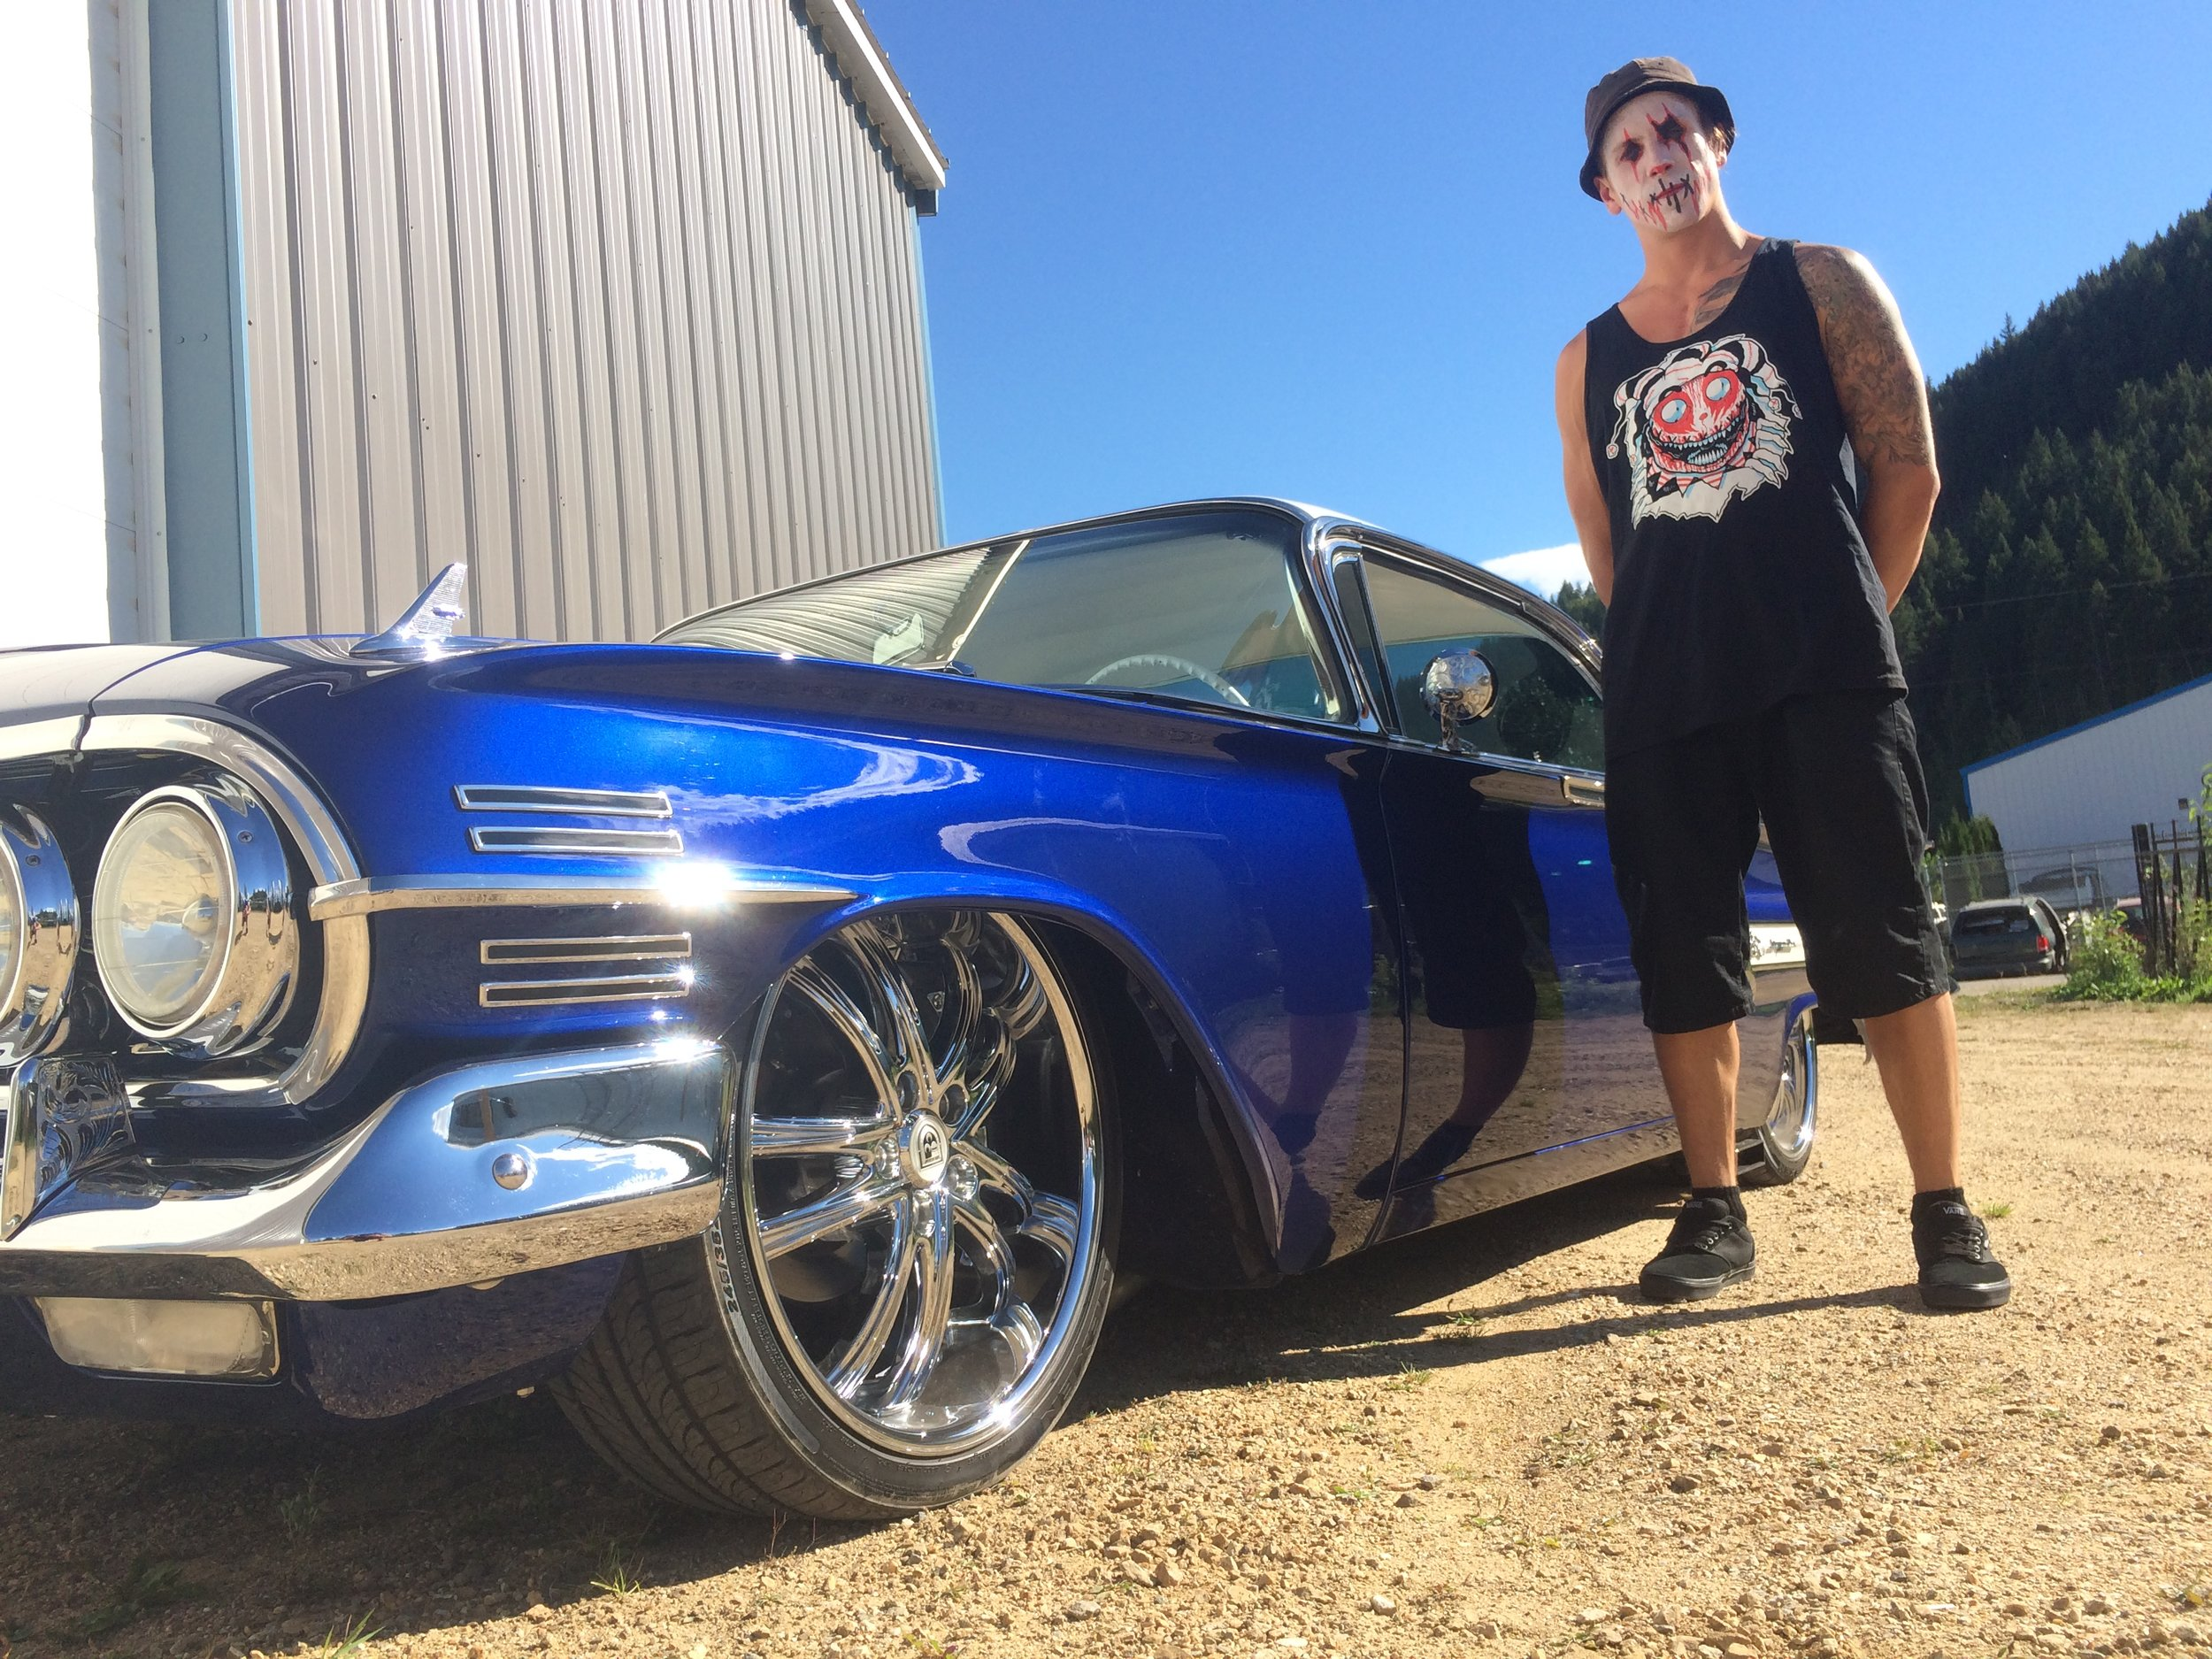 Abstrakt Impala Promo.JPG